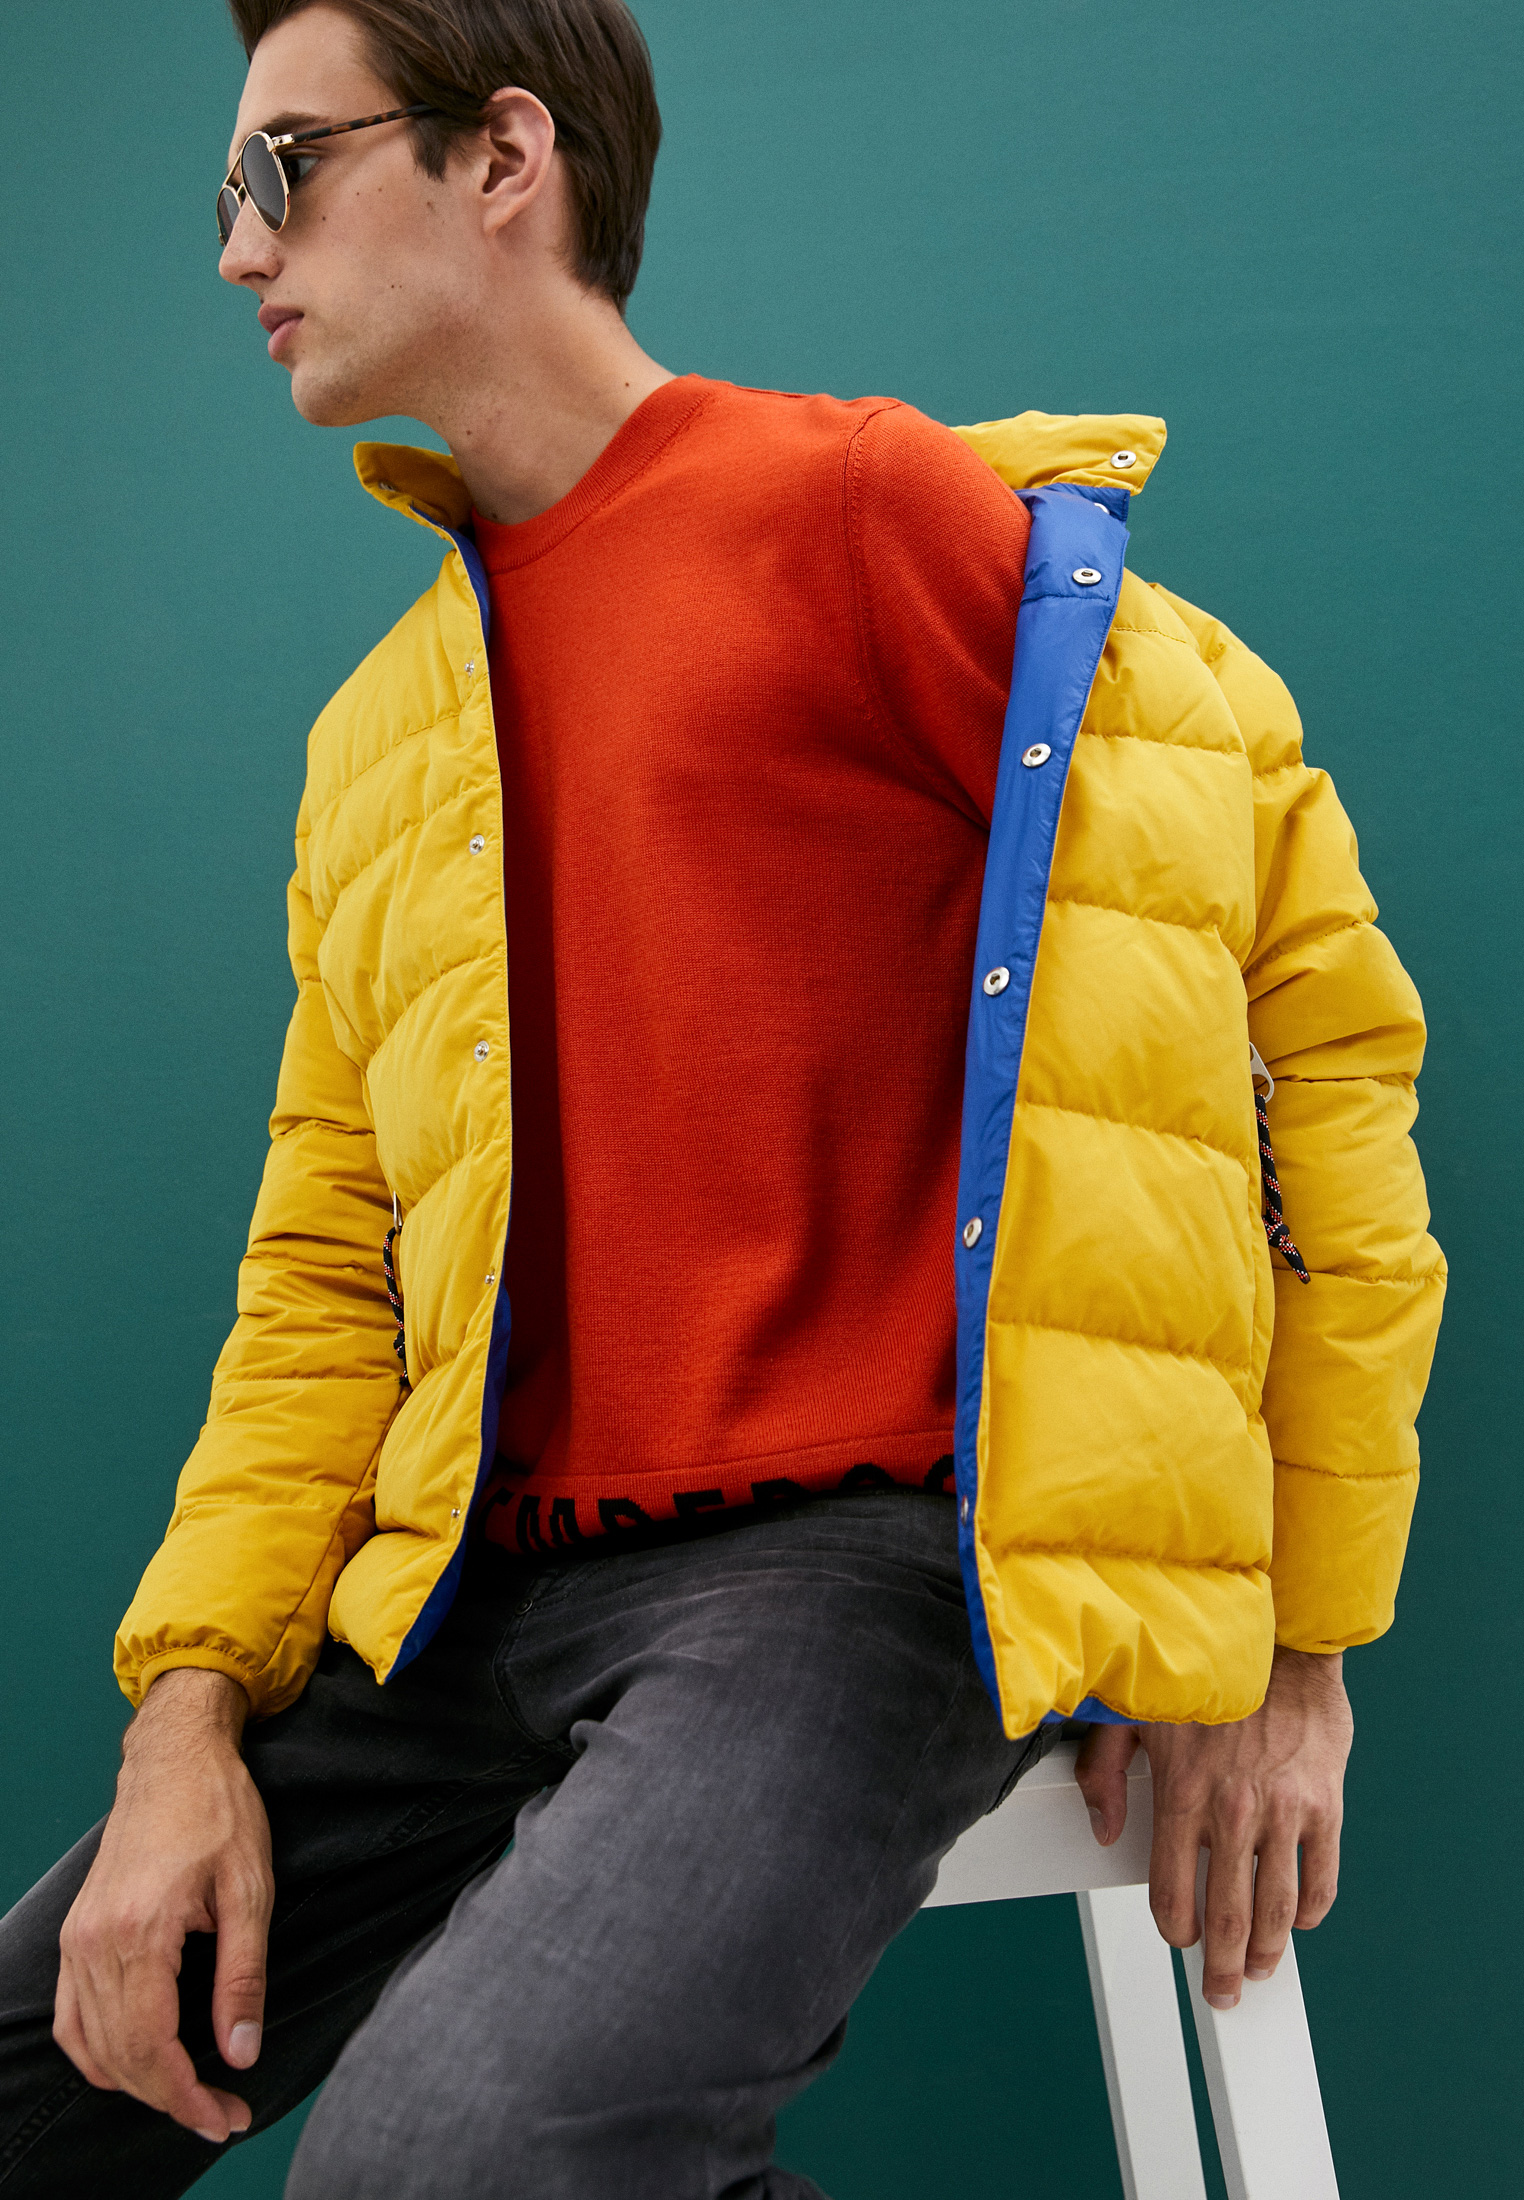 Мужская куртка Bikkembergs (Биккембергс) C H 087 00 T 9839: изображение 2